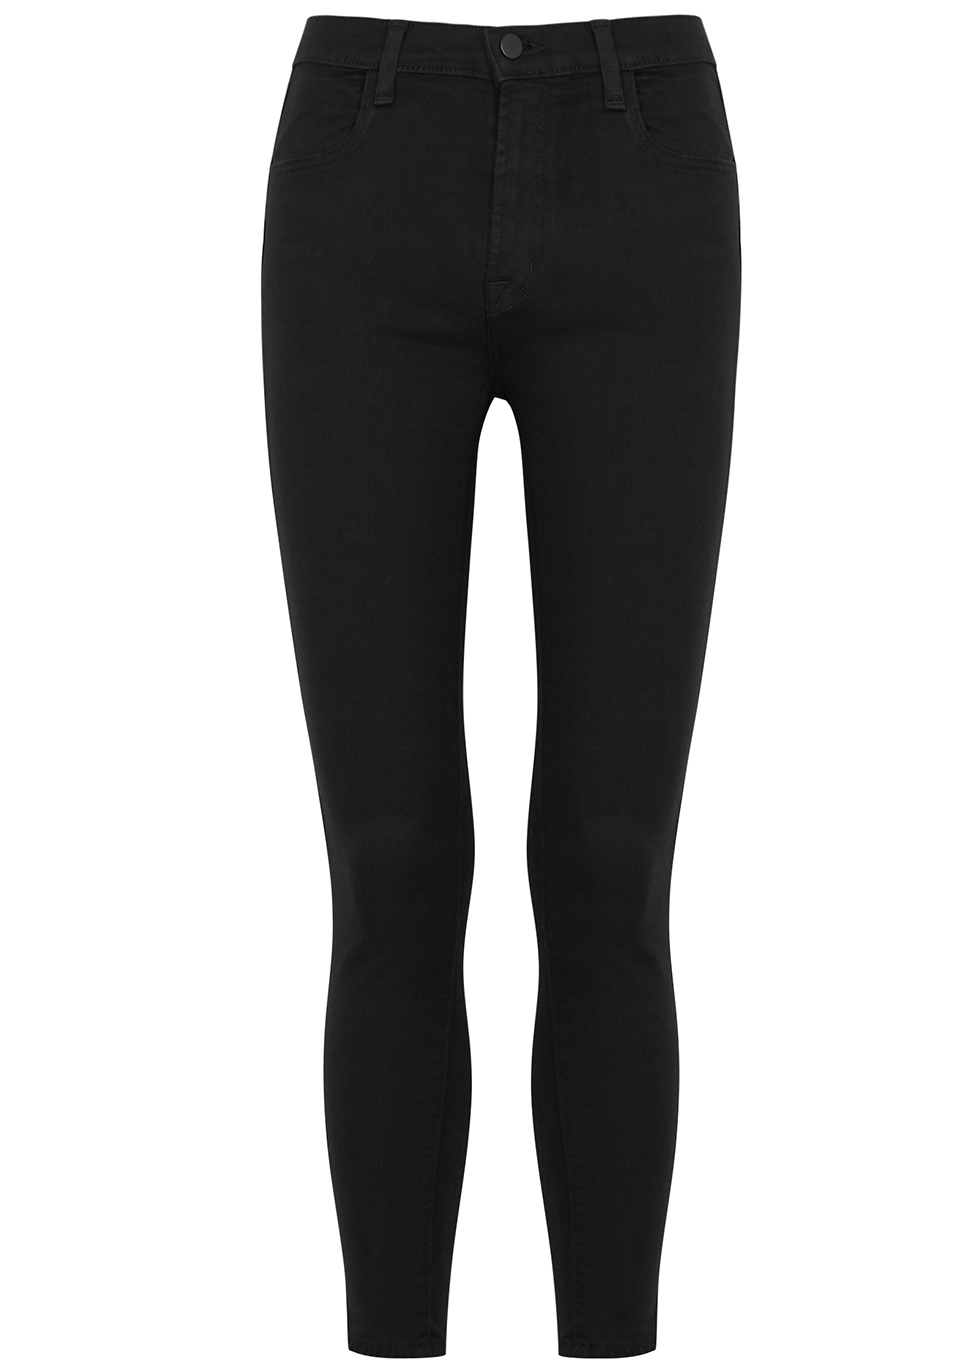 Alana black skinny jeans